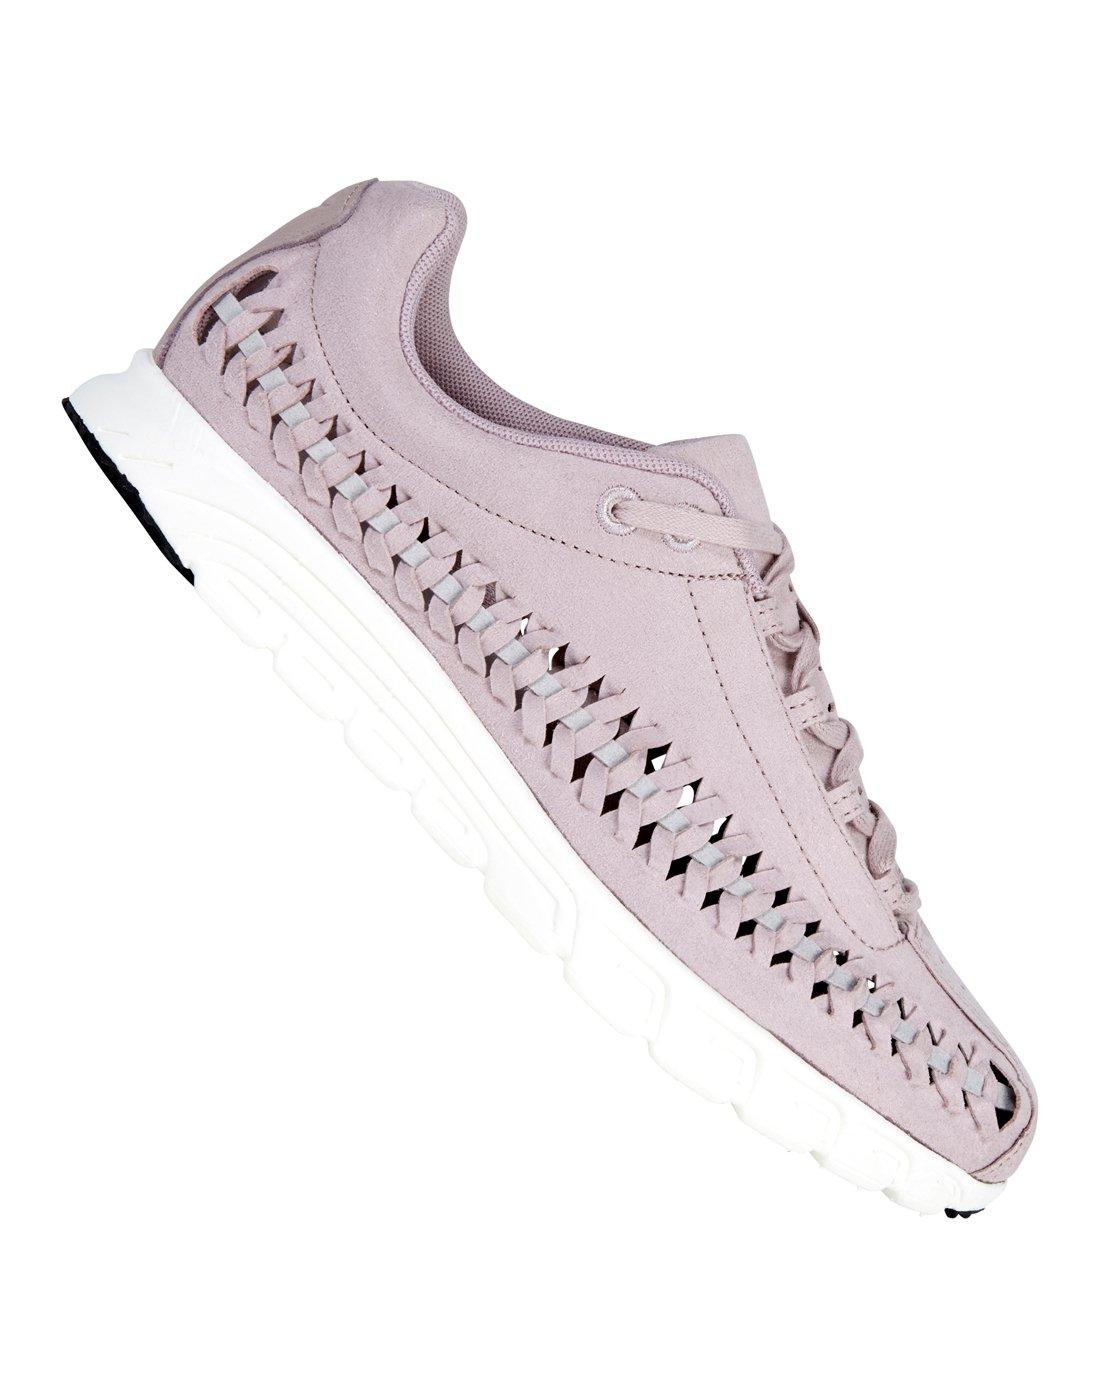 a34c1bba5eed1 Women s Nike Mayfly Woven